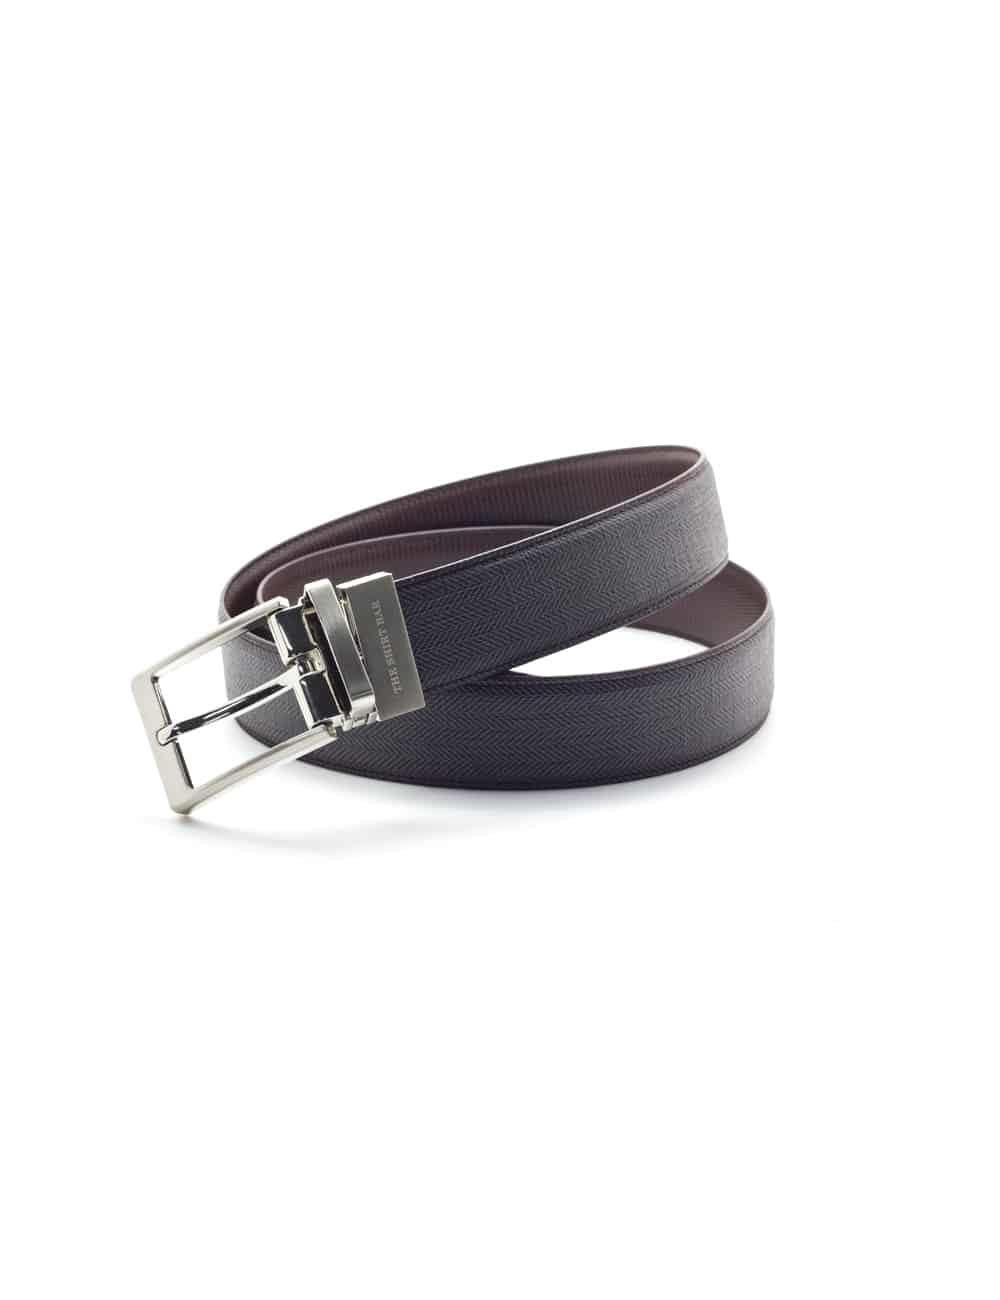 Brown Textured Reversible Leather Belt LBR10.6